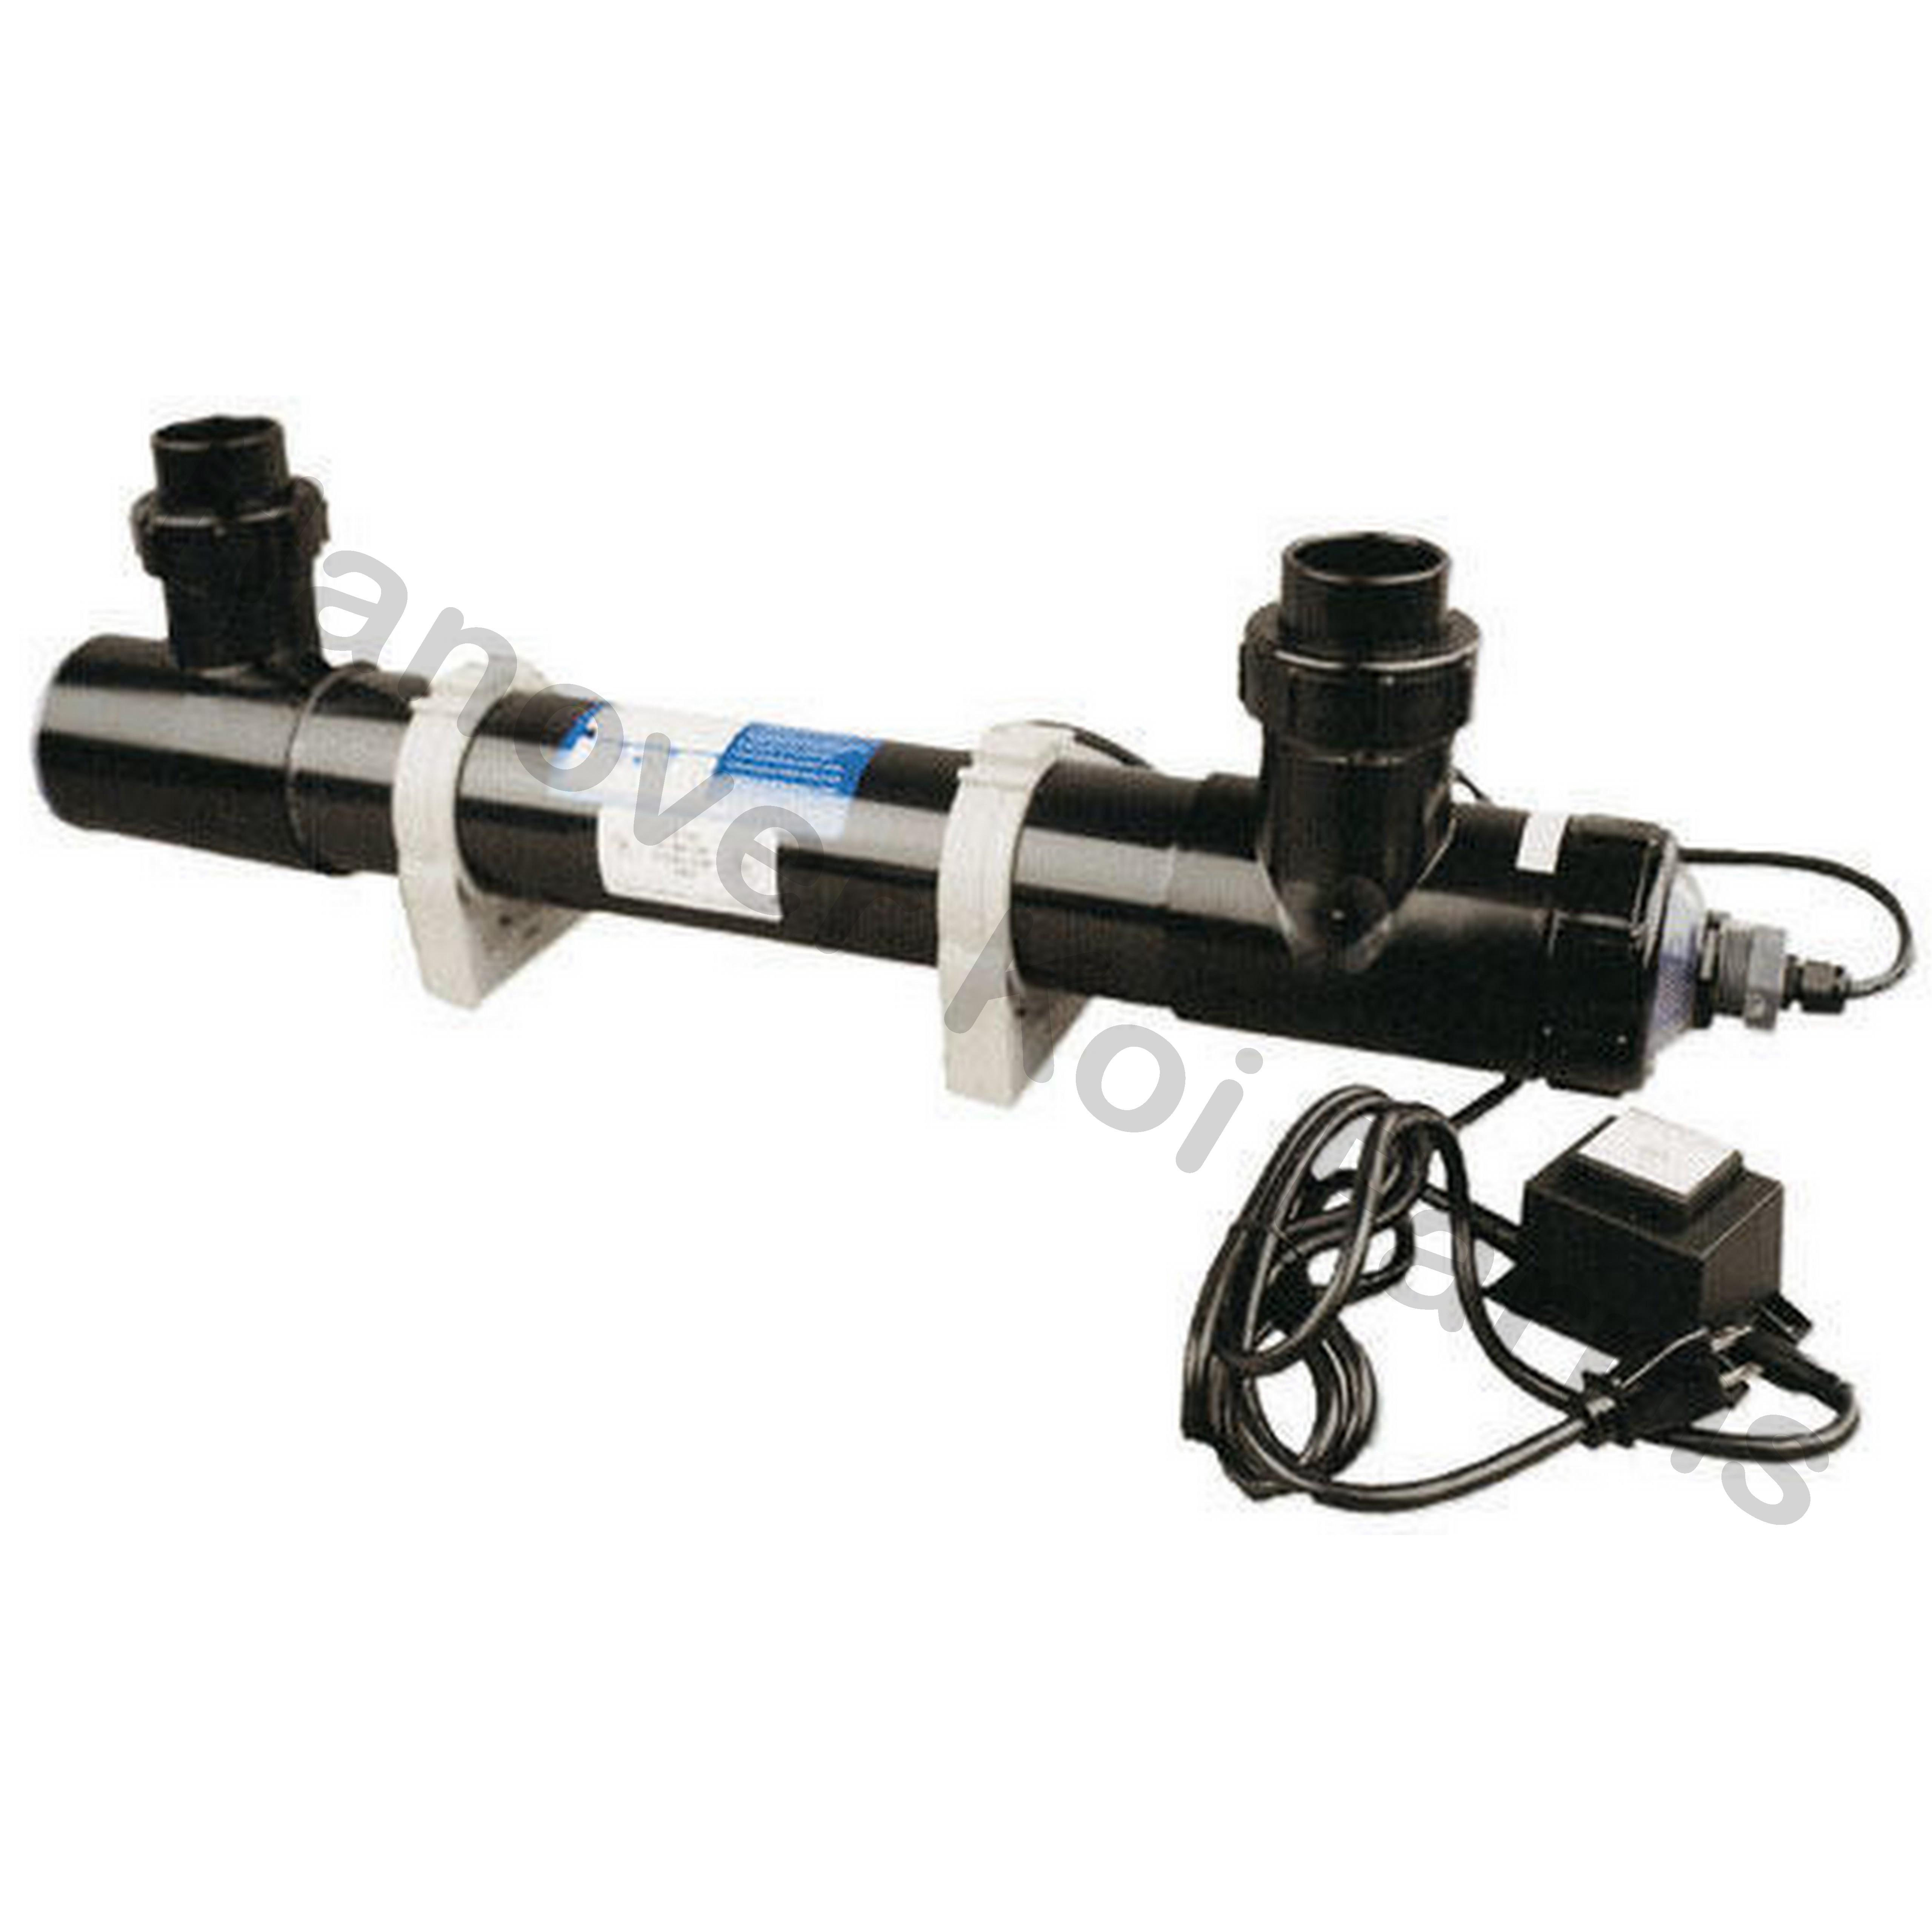 Pond uv light 25 watt emperor sterilizer series eu25 u for Uv light for koi pond